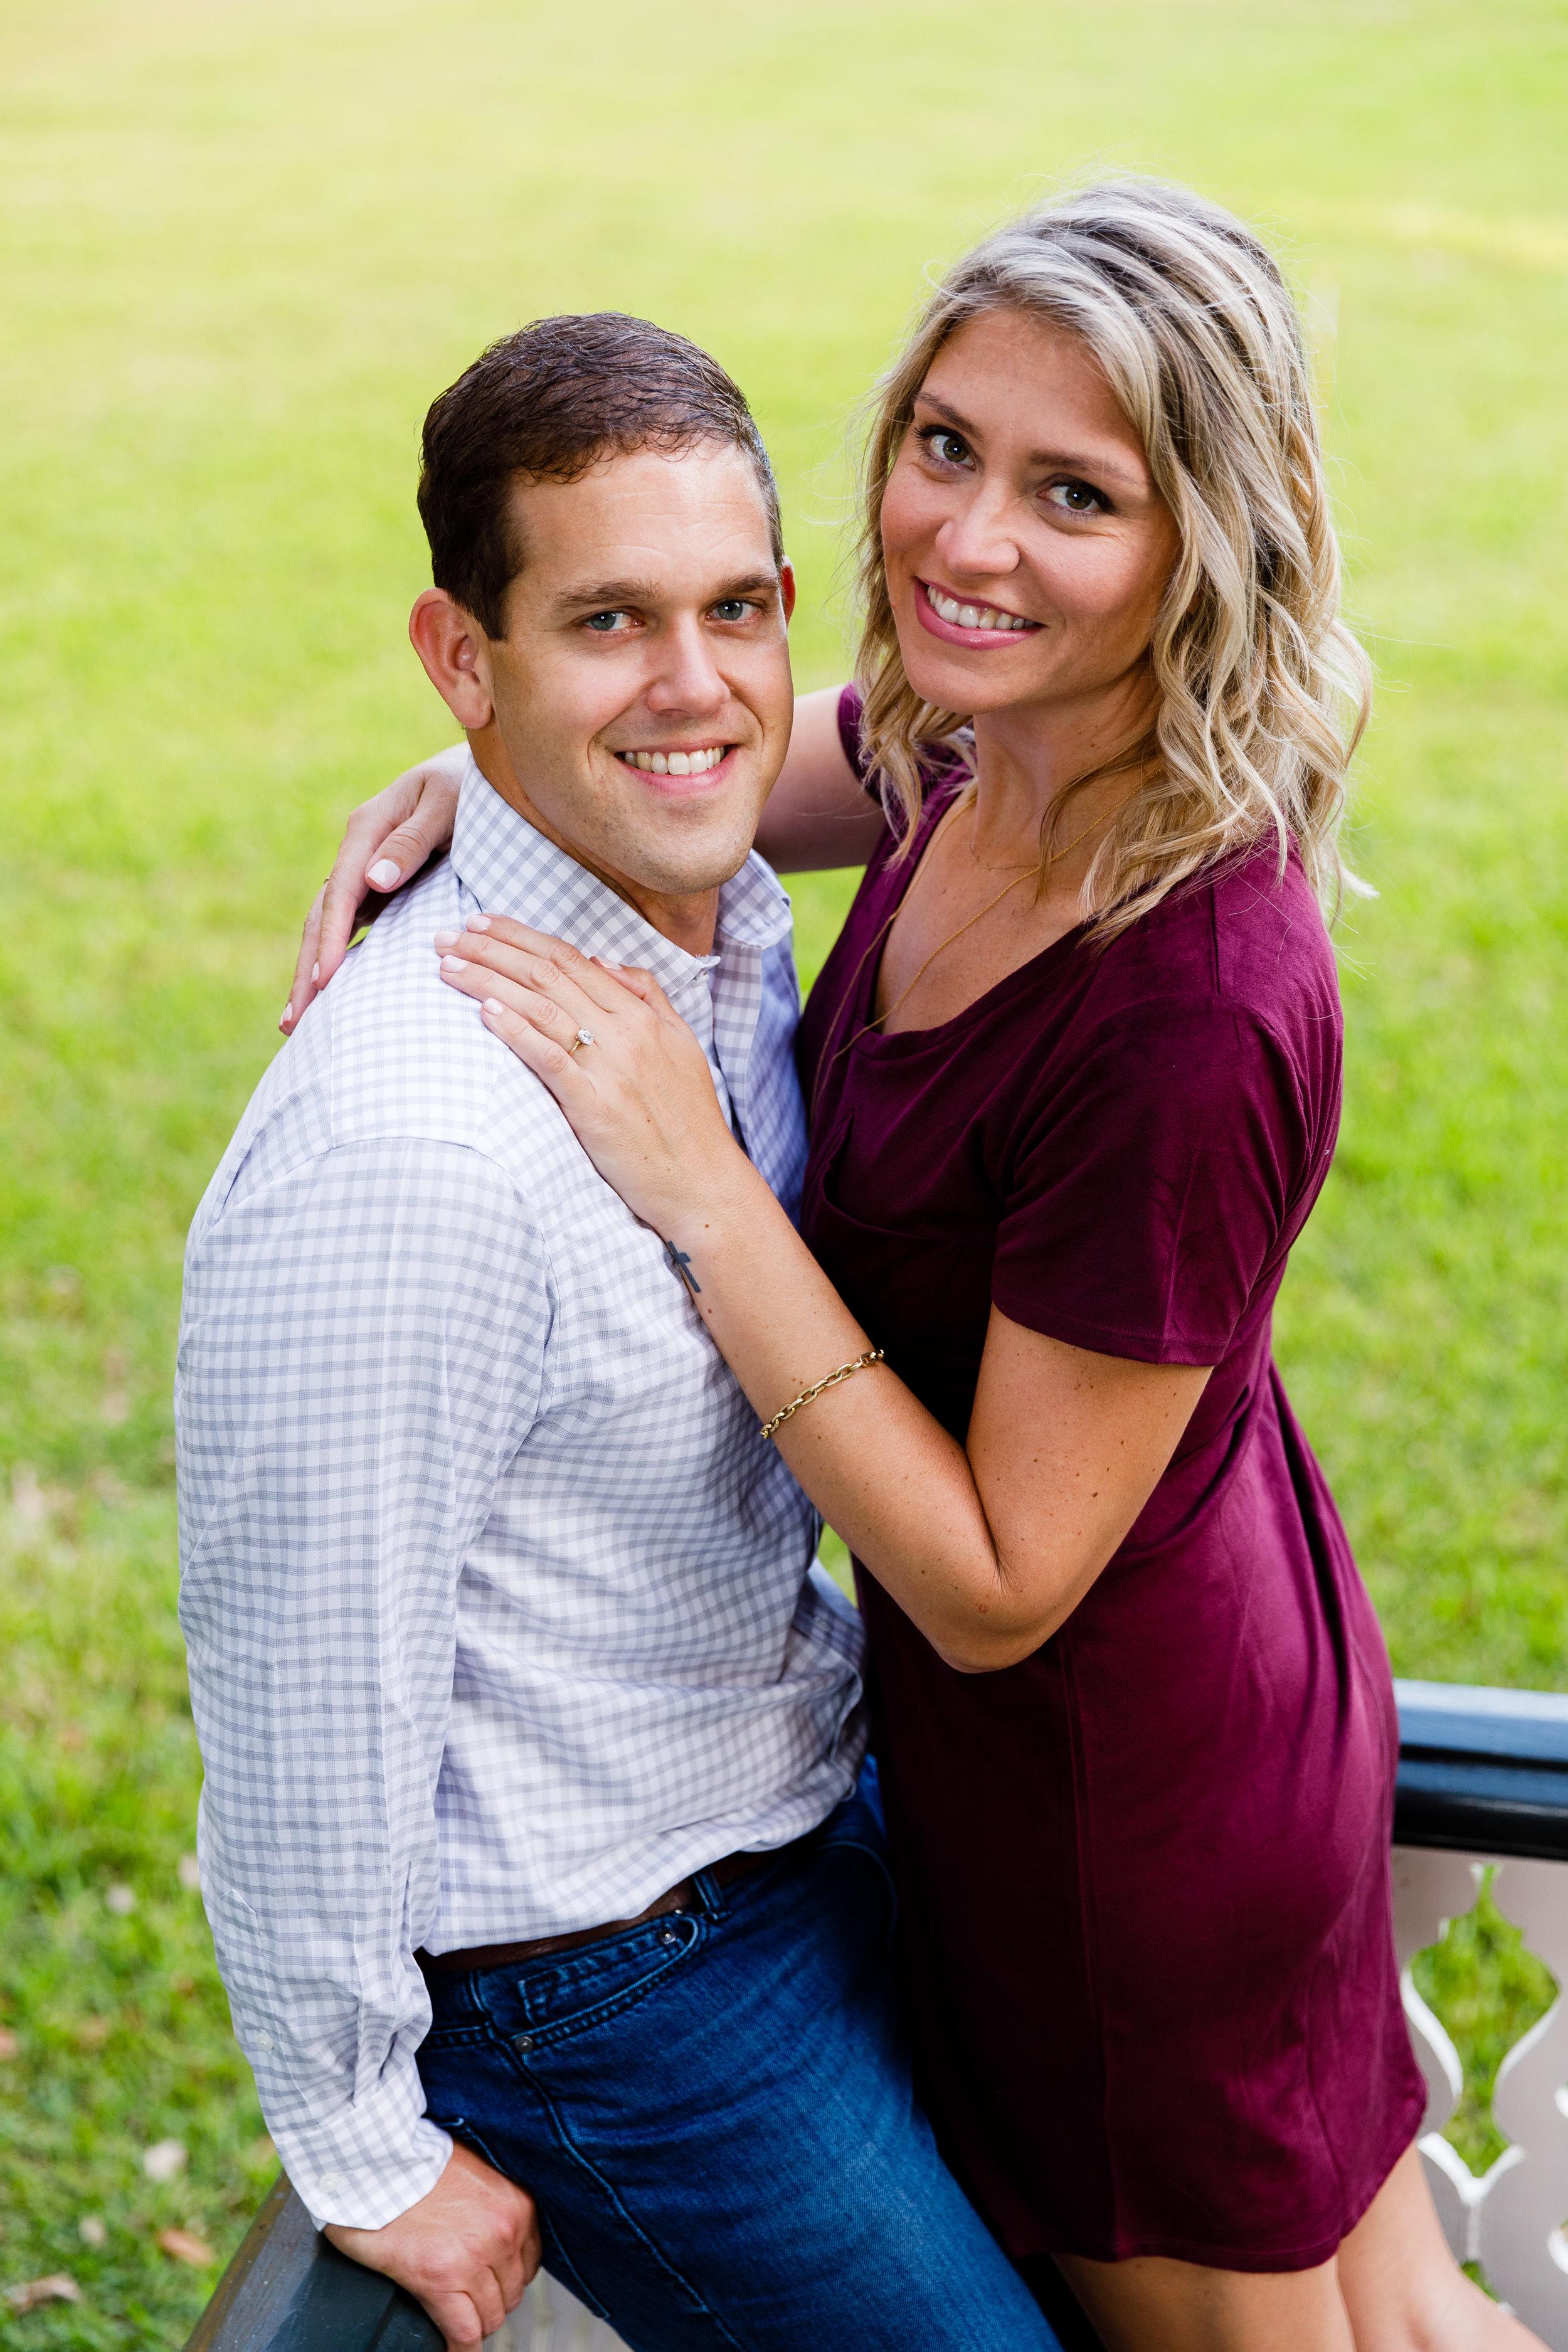 Youngsville-lafayette-portrait-family-wedding-photographer-8989.jpg